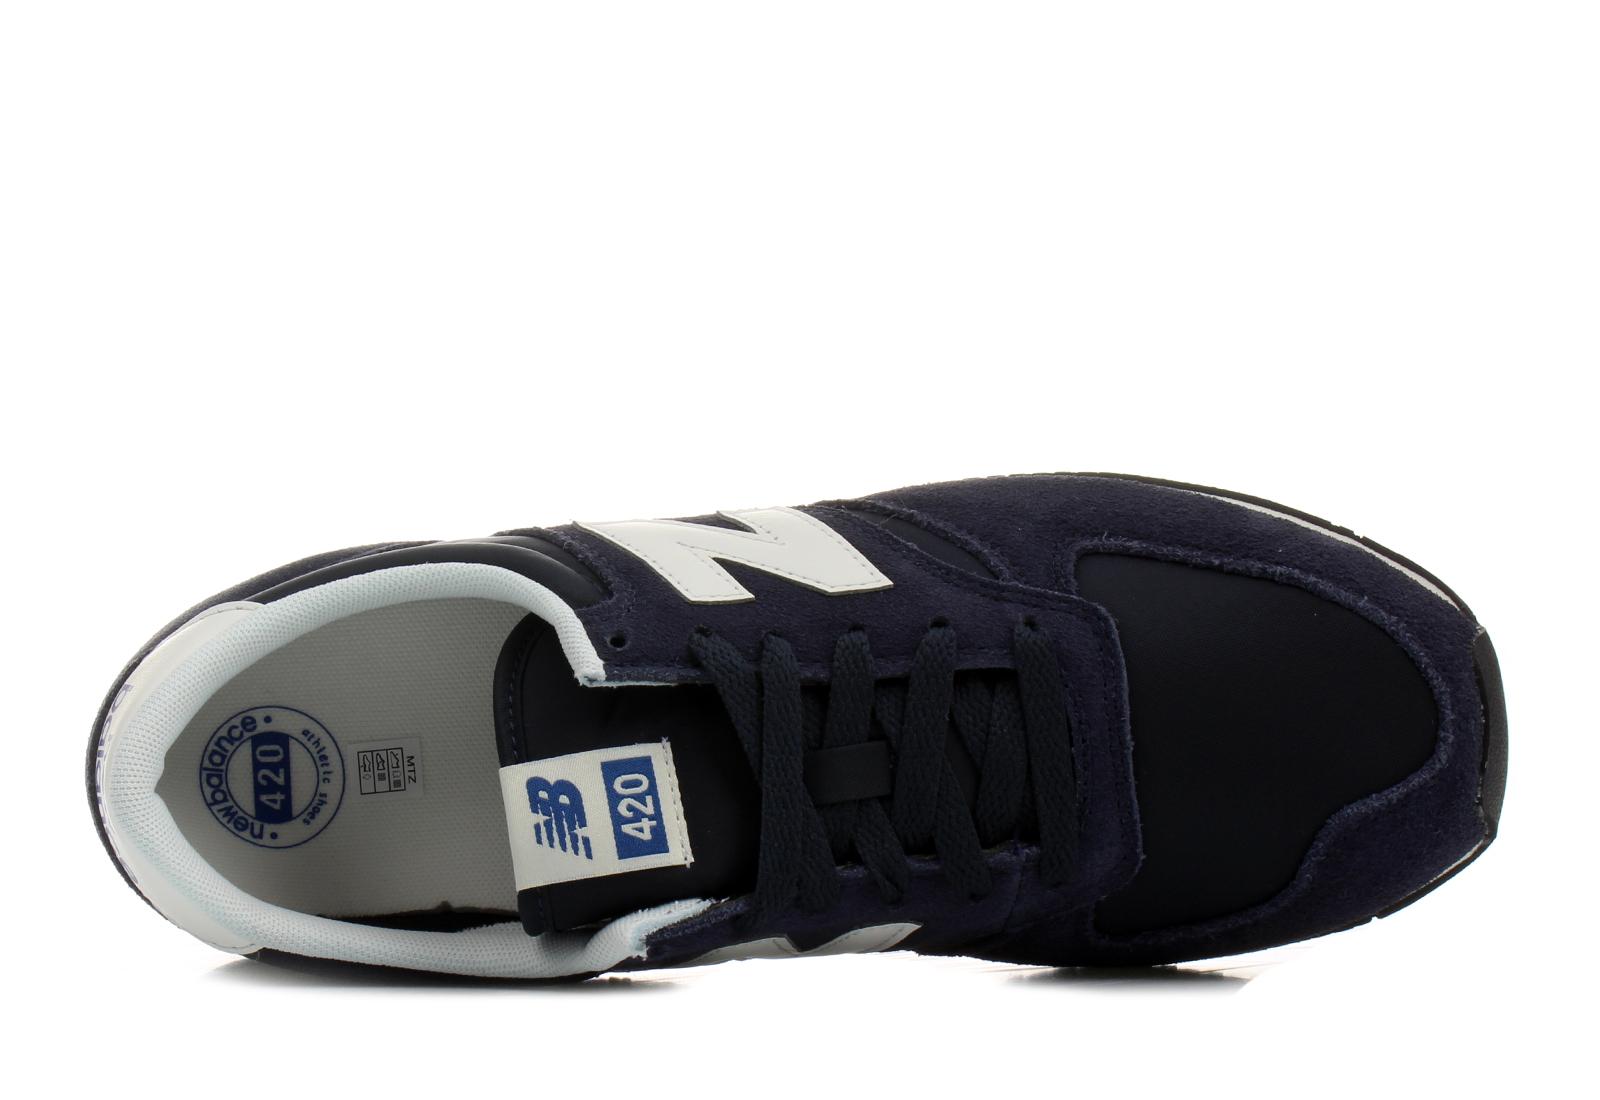 4c9683fce77 New Balance Niske Cipele Plave Cipele - U420 - Office Shoes - Online  trgovina obuće